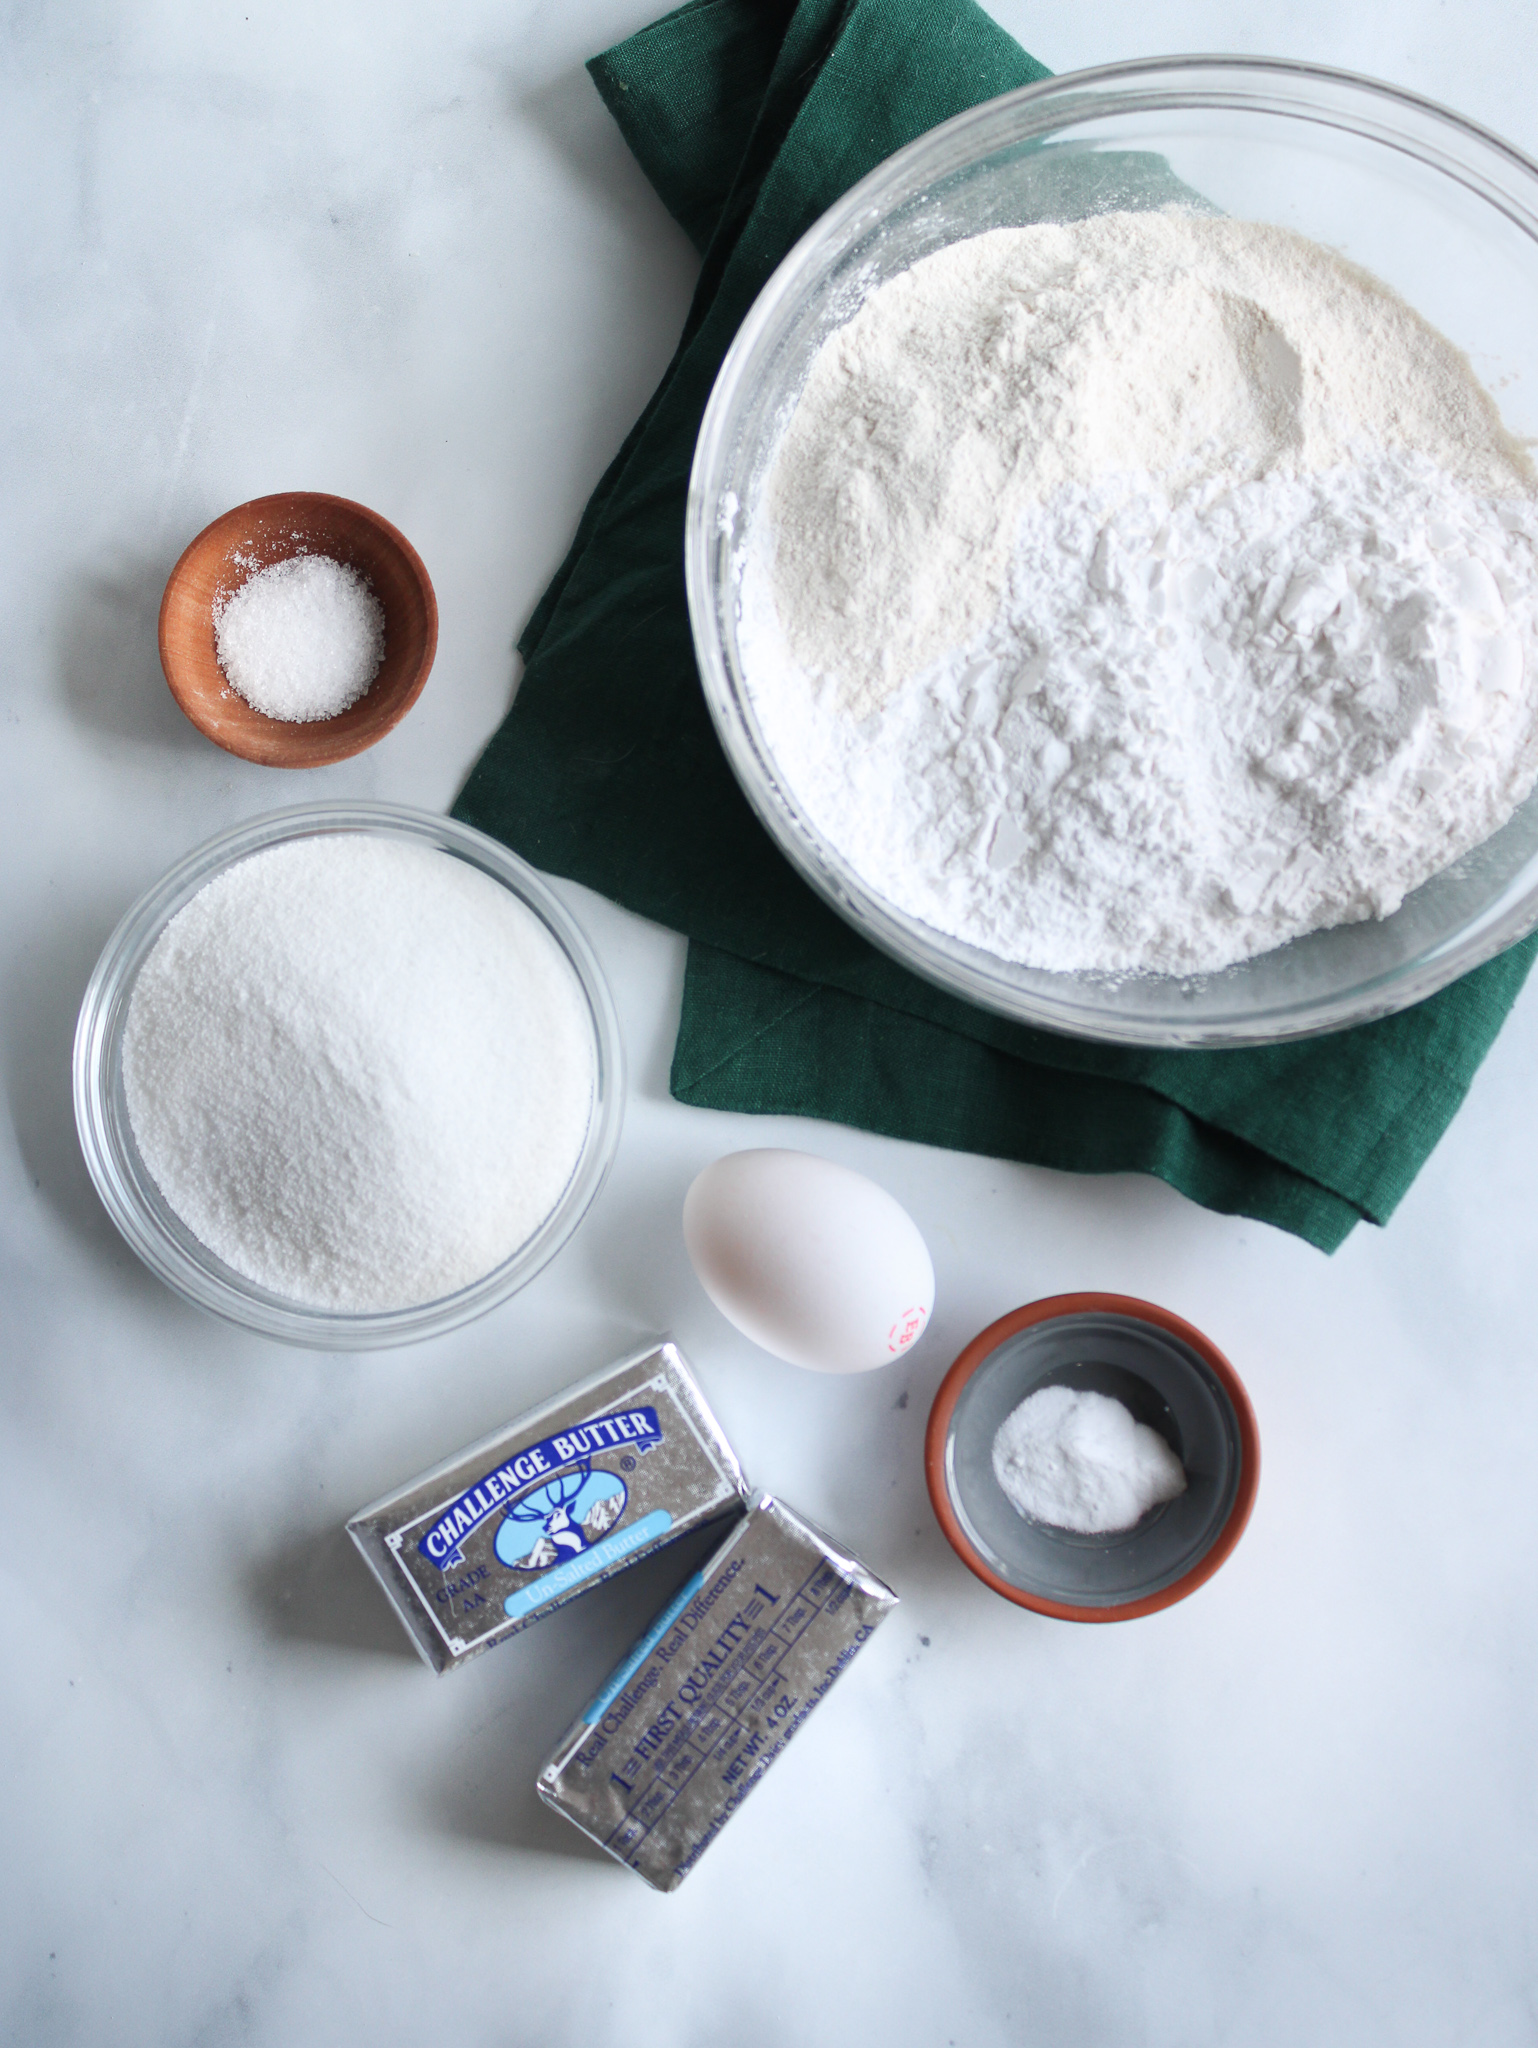 Gluten free cut out sugar cookie ingredients cassava flour, arrowroot starch, sugar, butterm egg, salt, baking soda and vanilla